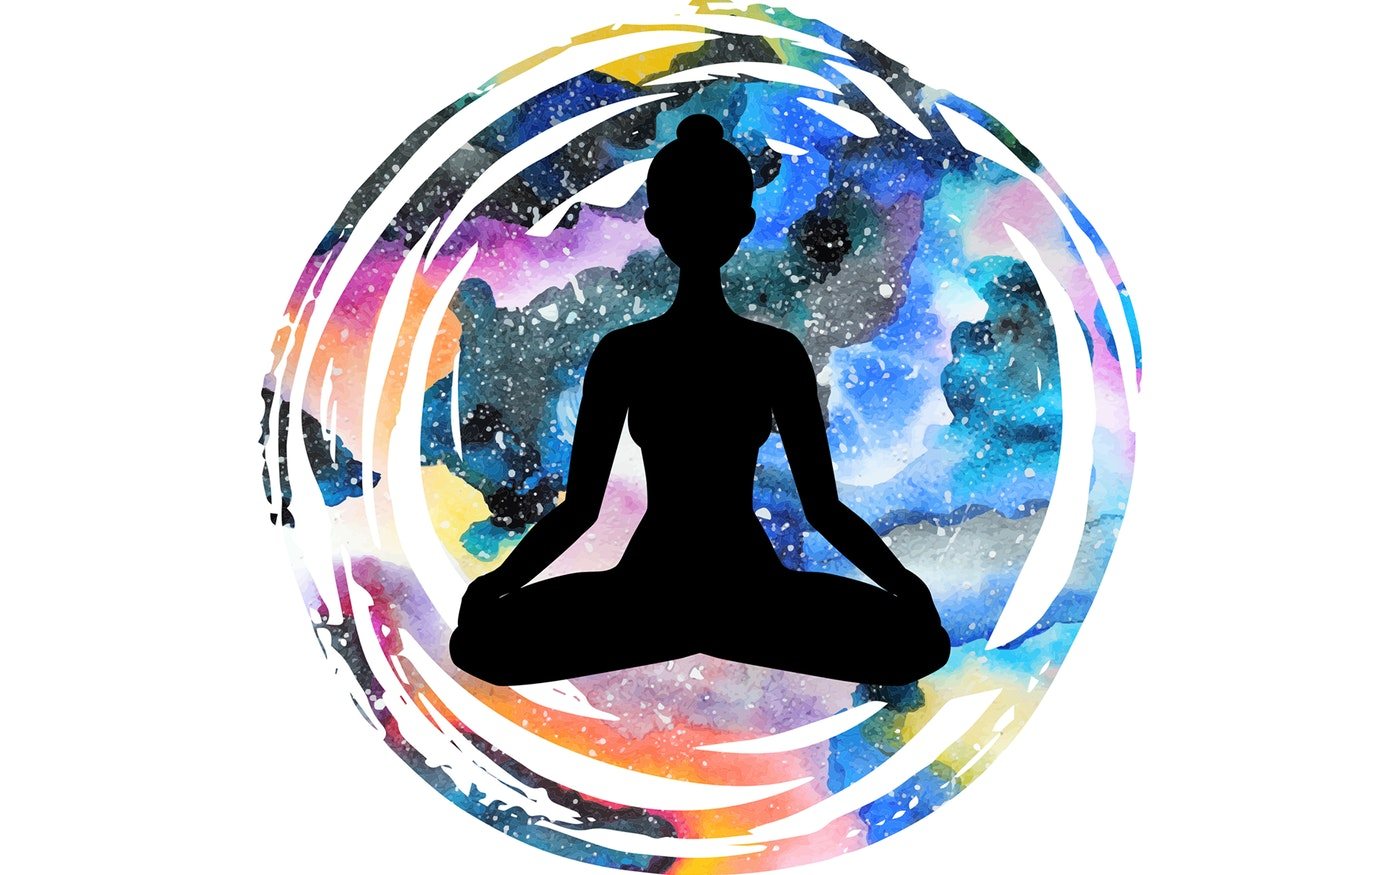 Meditation clipart self control. Mixing and magic mushrooms